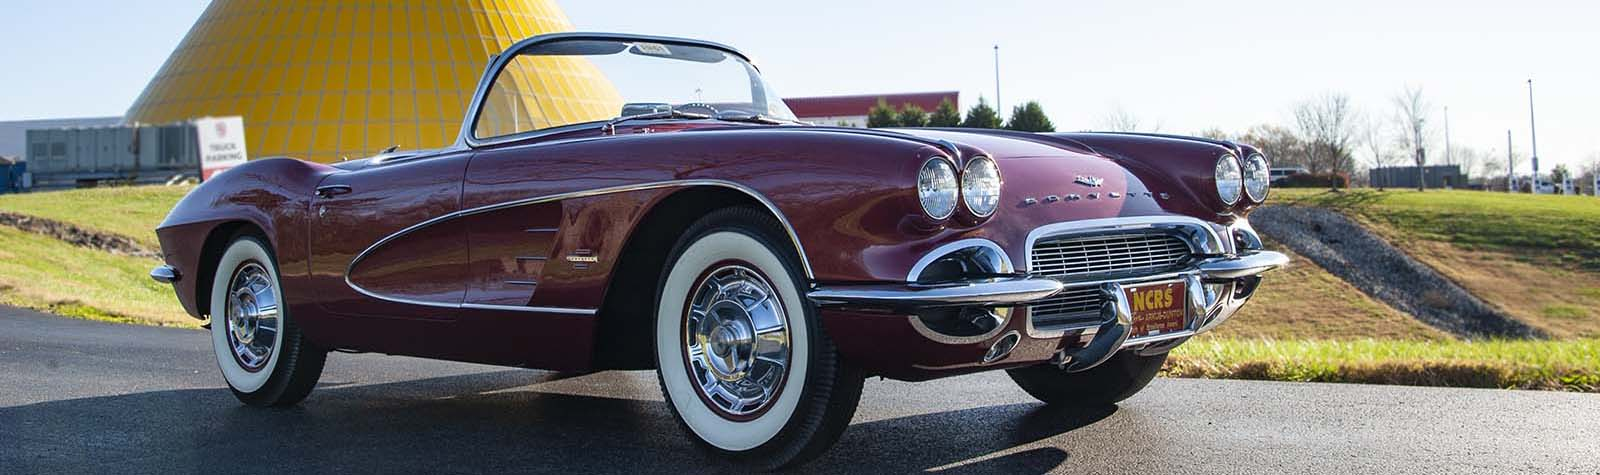 Award-Winning 1961 Corvette Donated